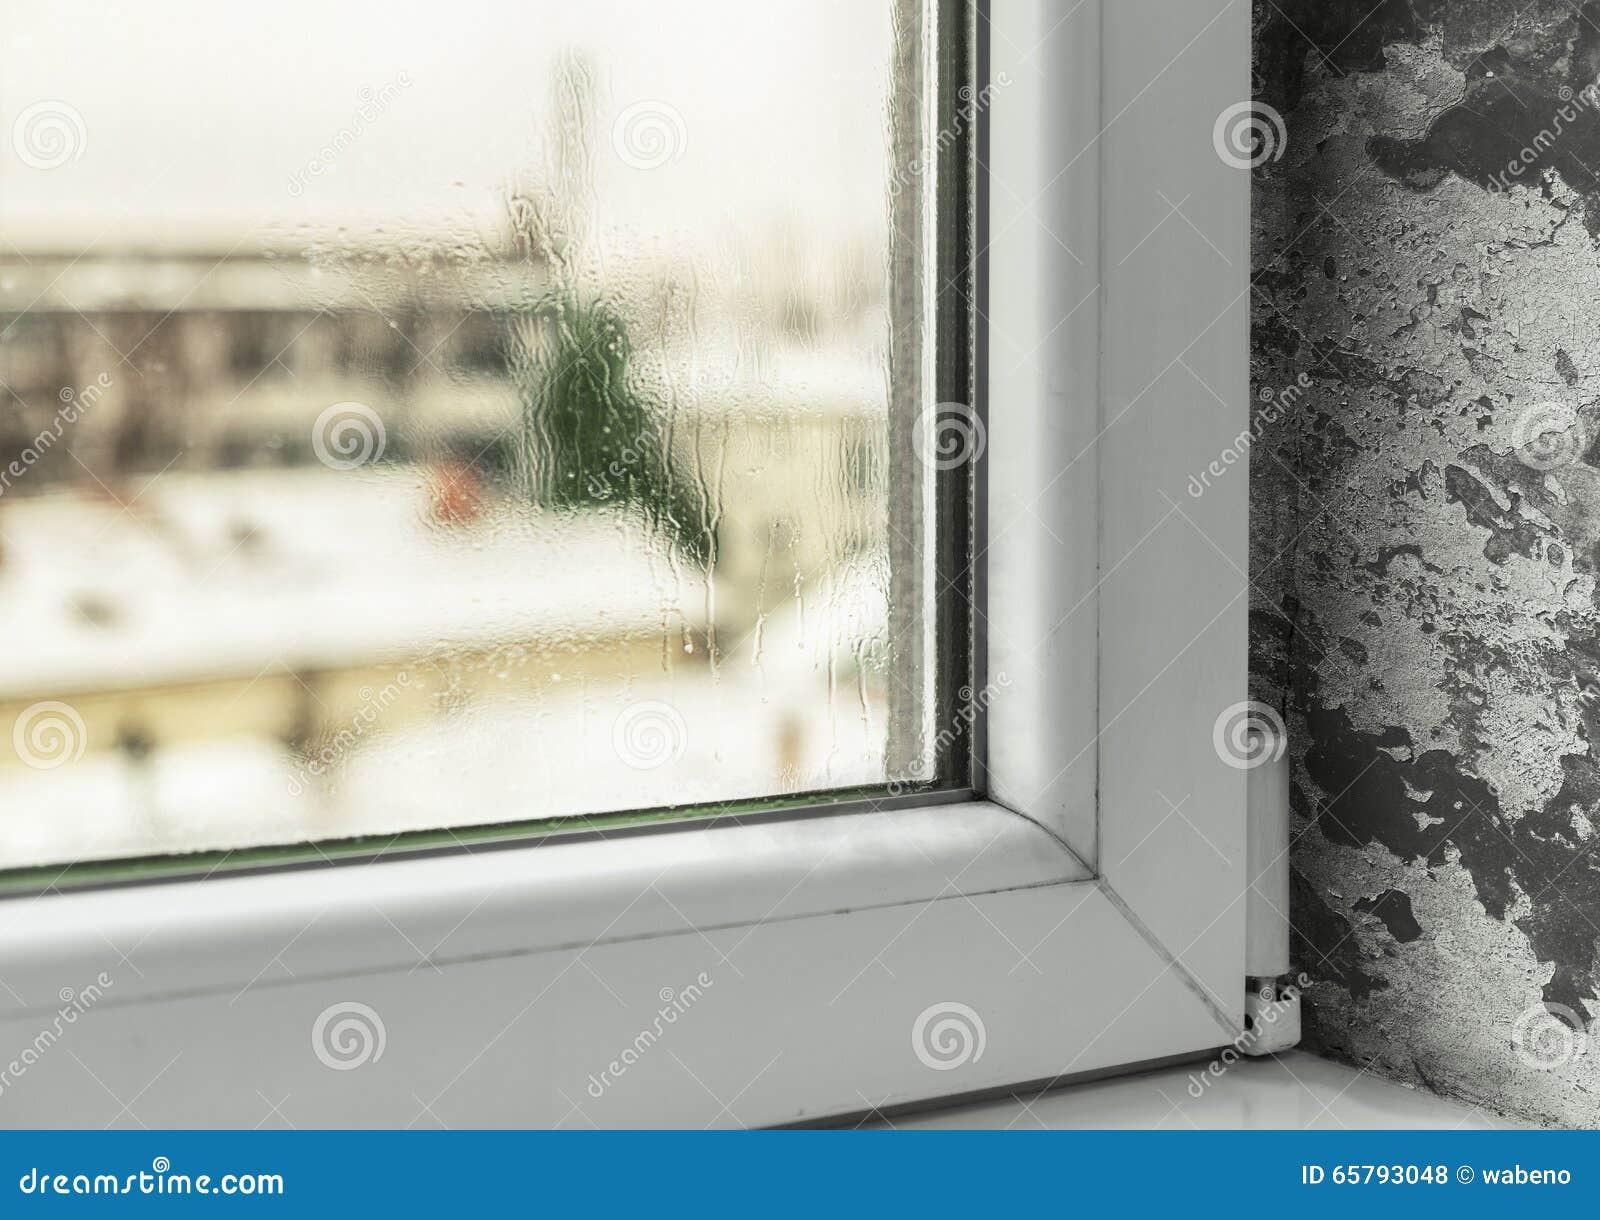 Humidit fenetre maison ventana blog - Cause humidite maison ...